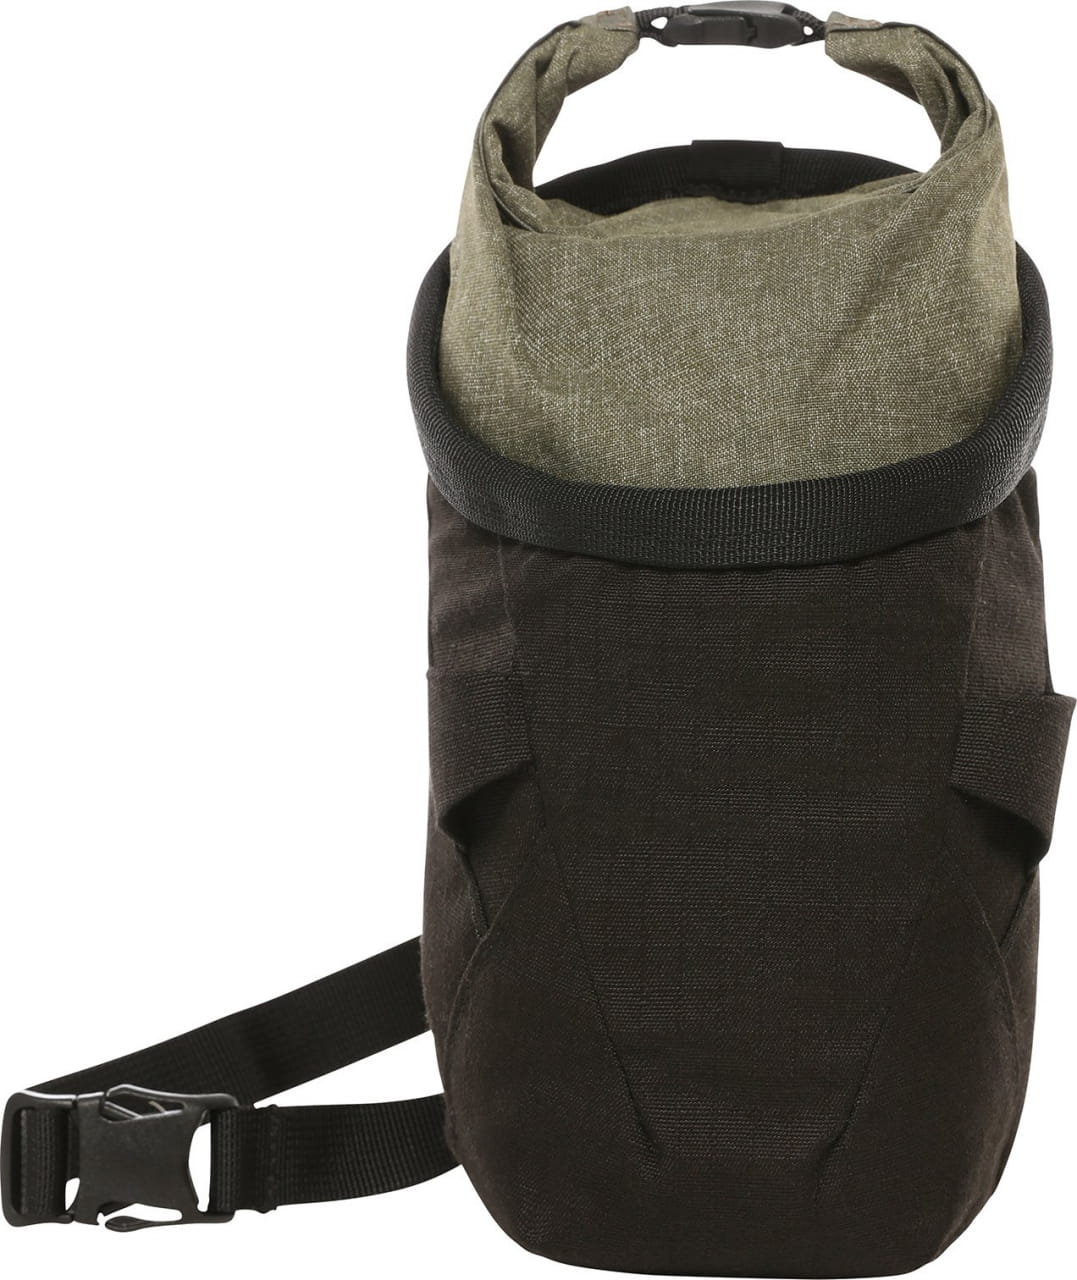 Kletter-Ausrüstung The North Face North Dome Chalk Bag